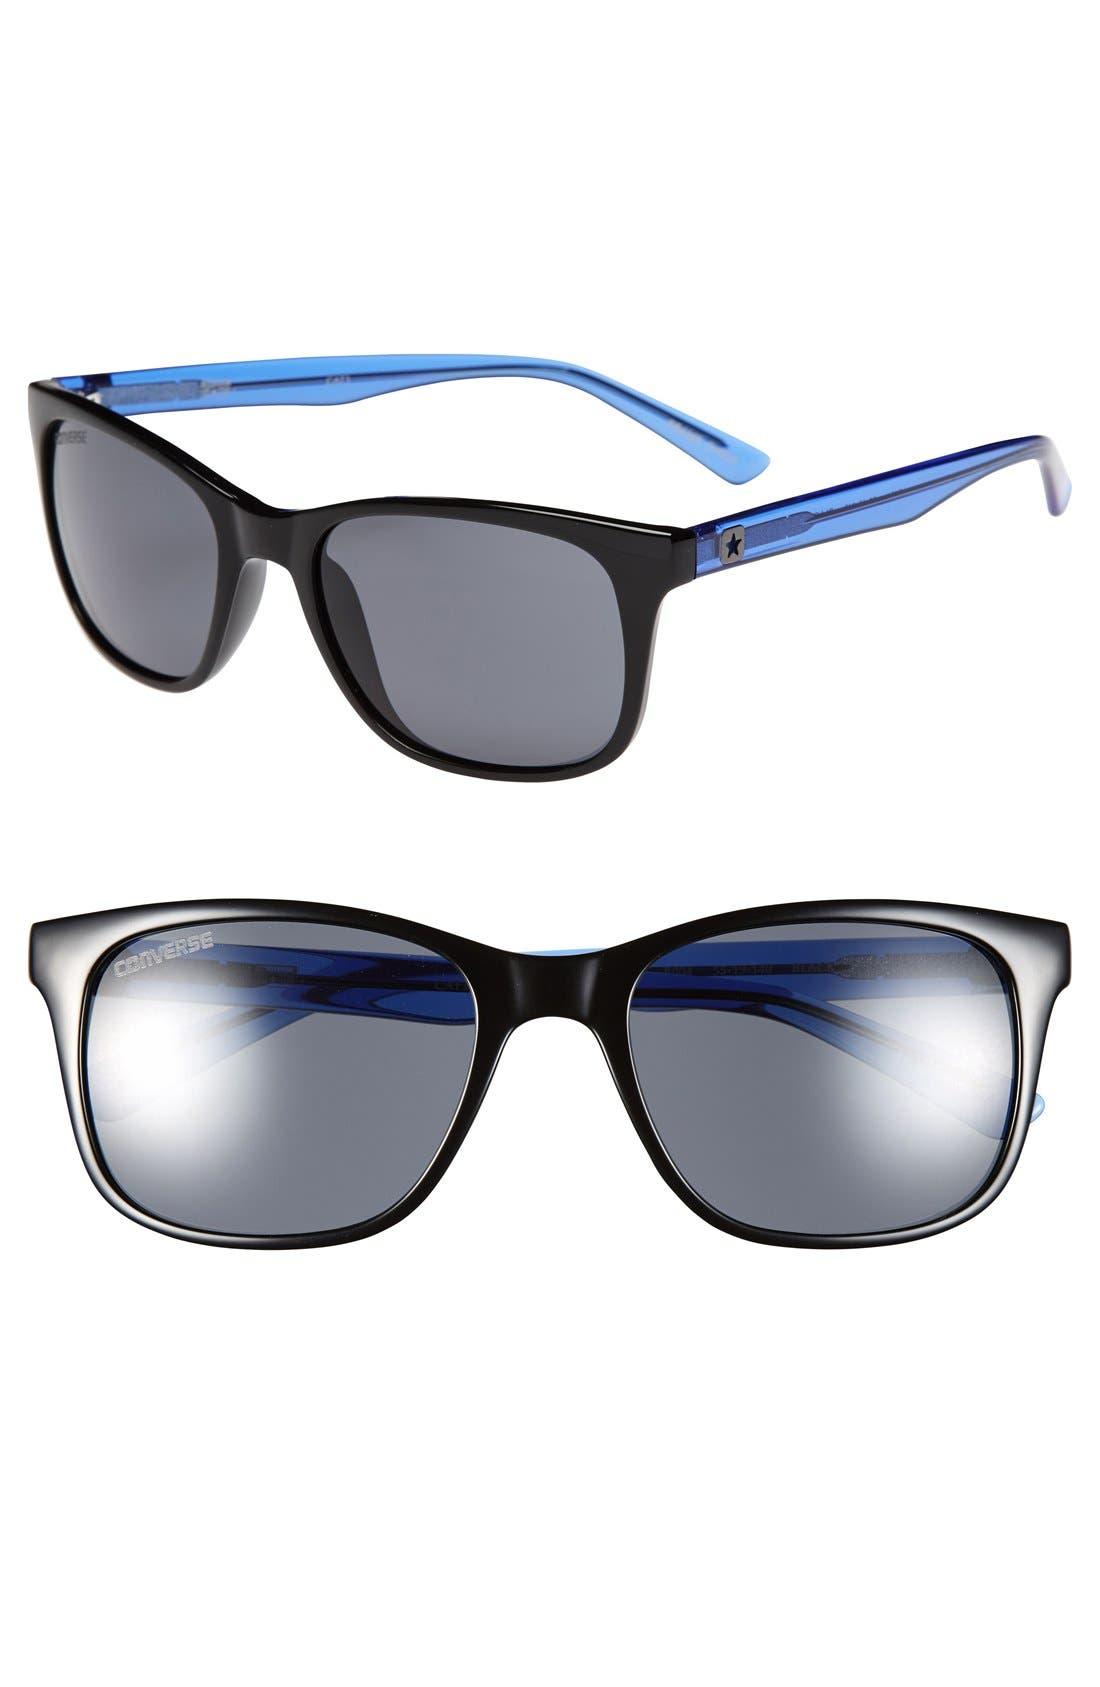 Alternate Image 1 Selected - Converse 55mm Retro Sunglasses